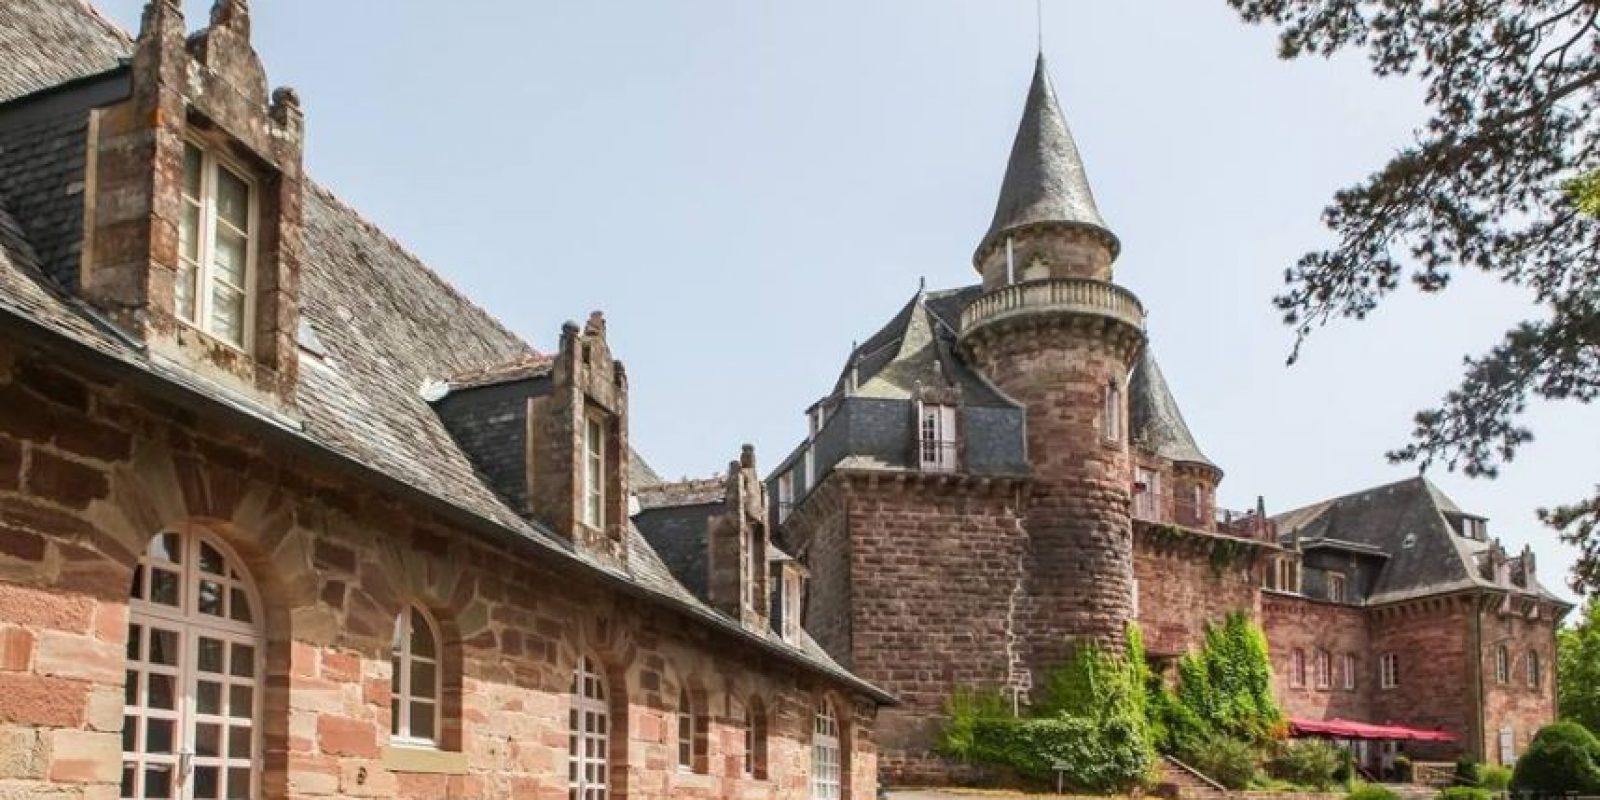 Cuenta con una piscina exterior Foto:Facebook.com/pages/Château-de-Castel-Novel